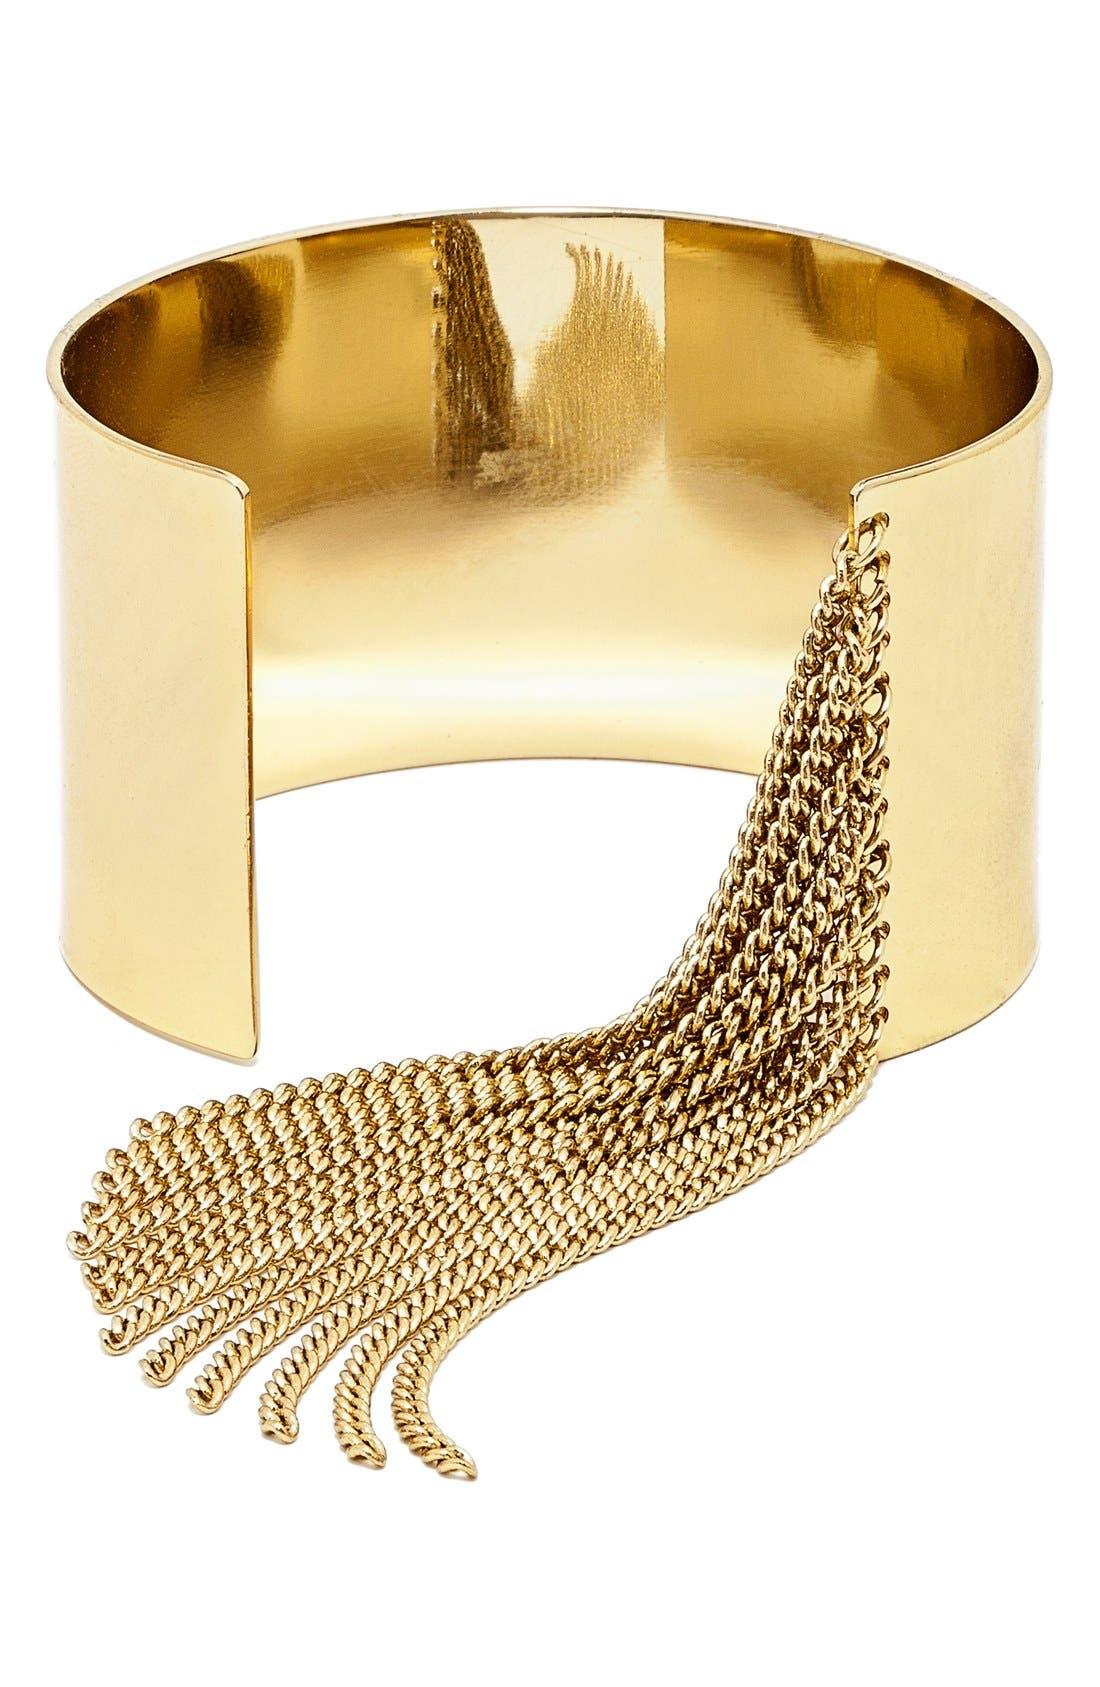 Main Image - BaubleBar'Cowgirl' Cuff Bracelet